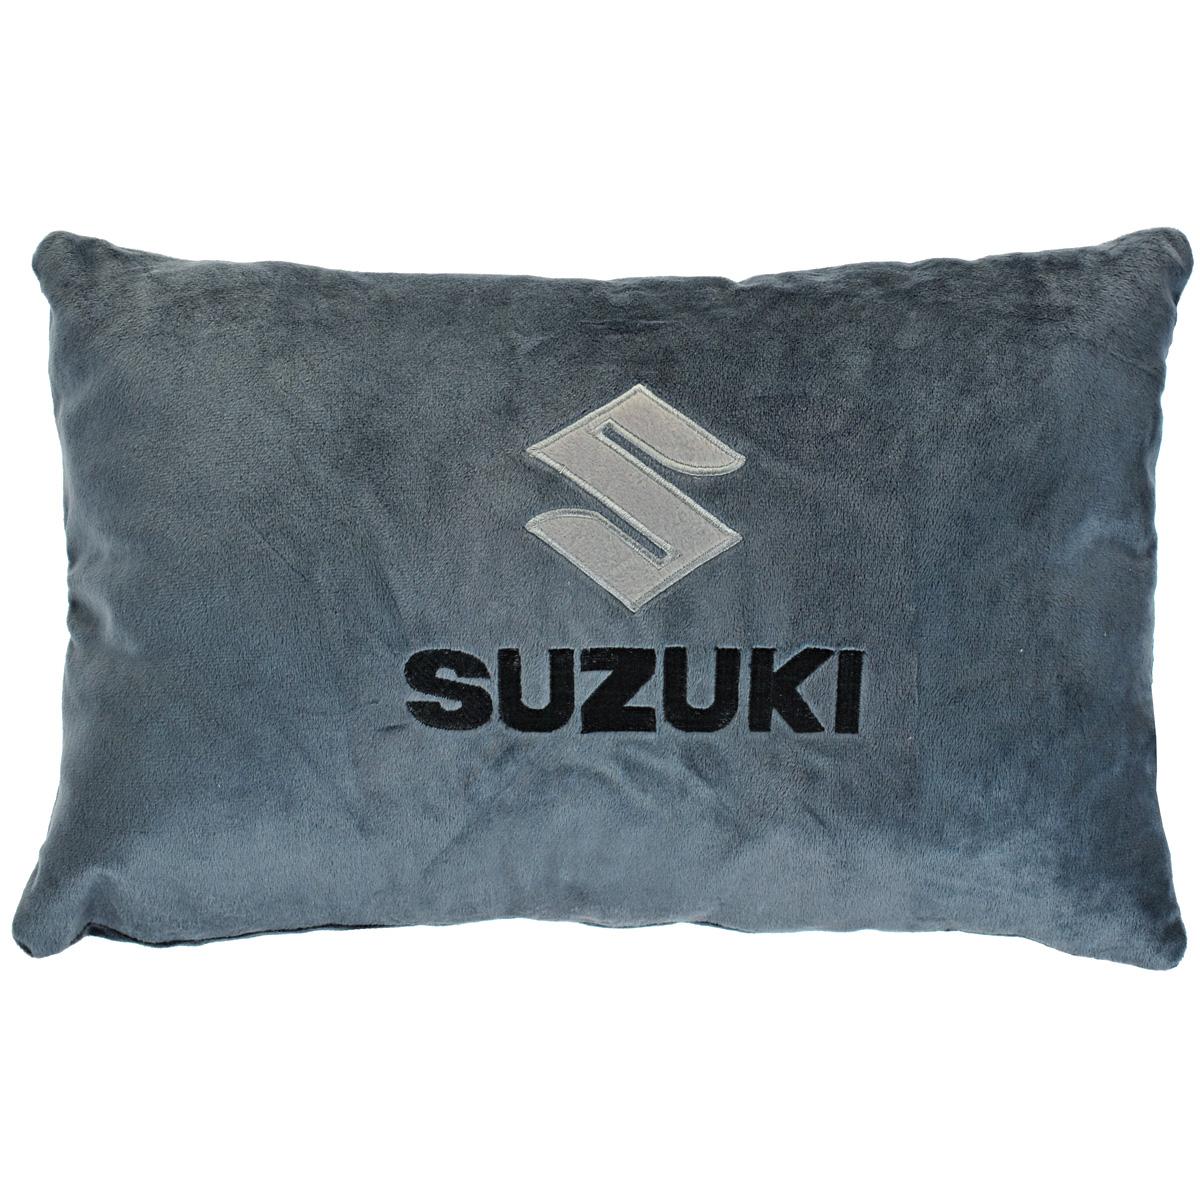 "Maxi Toys Подушка автомобильная ""Suzuki"", цвет: серый, 41 см х 25 см х 14 см PS-SUT121145G"